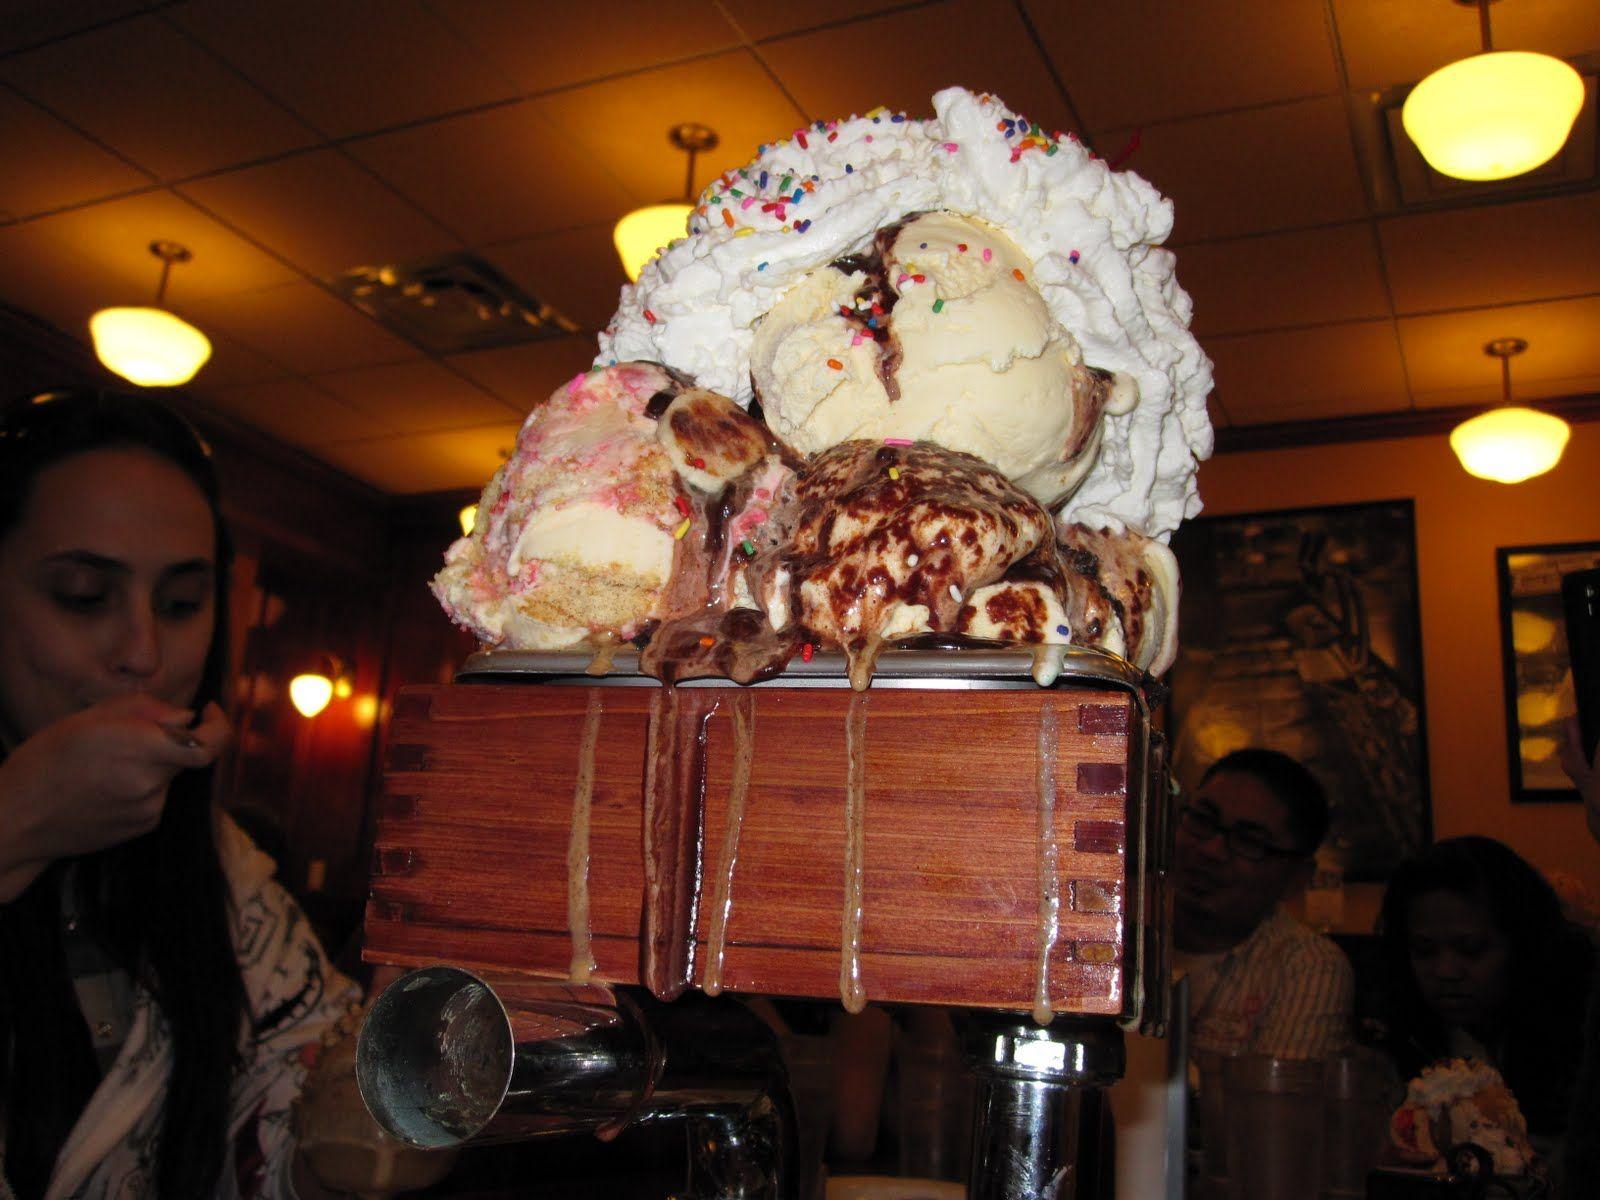 the kitchen sink ice cream challenge | Flat out crazy!!! | Pinterest ...